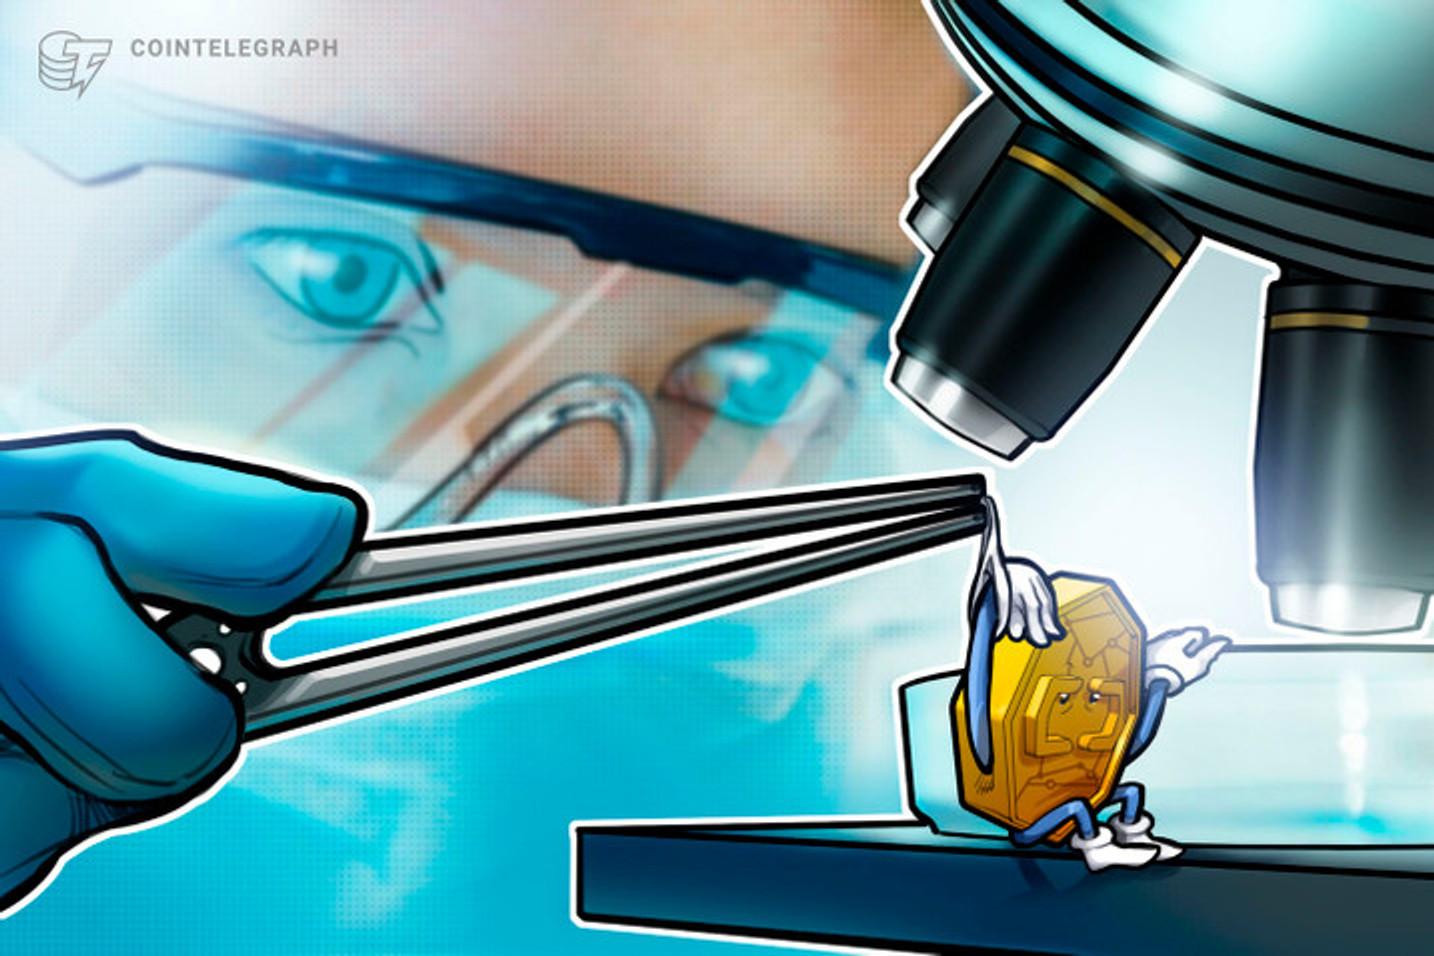 Conselho Nacional de Justiça vai publicar trabalho que analisa aspectos jurídicos do Bitcoin no Brasil